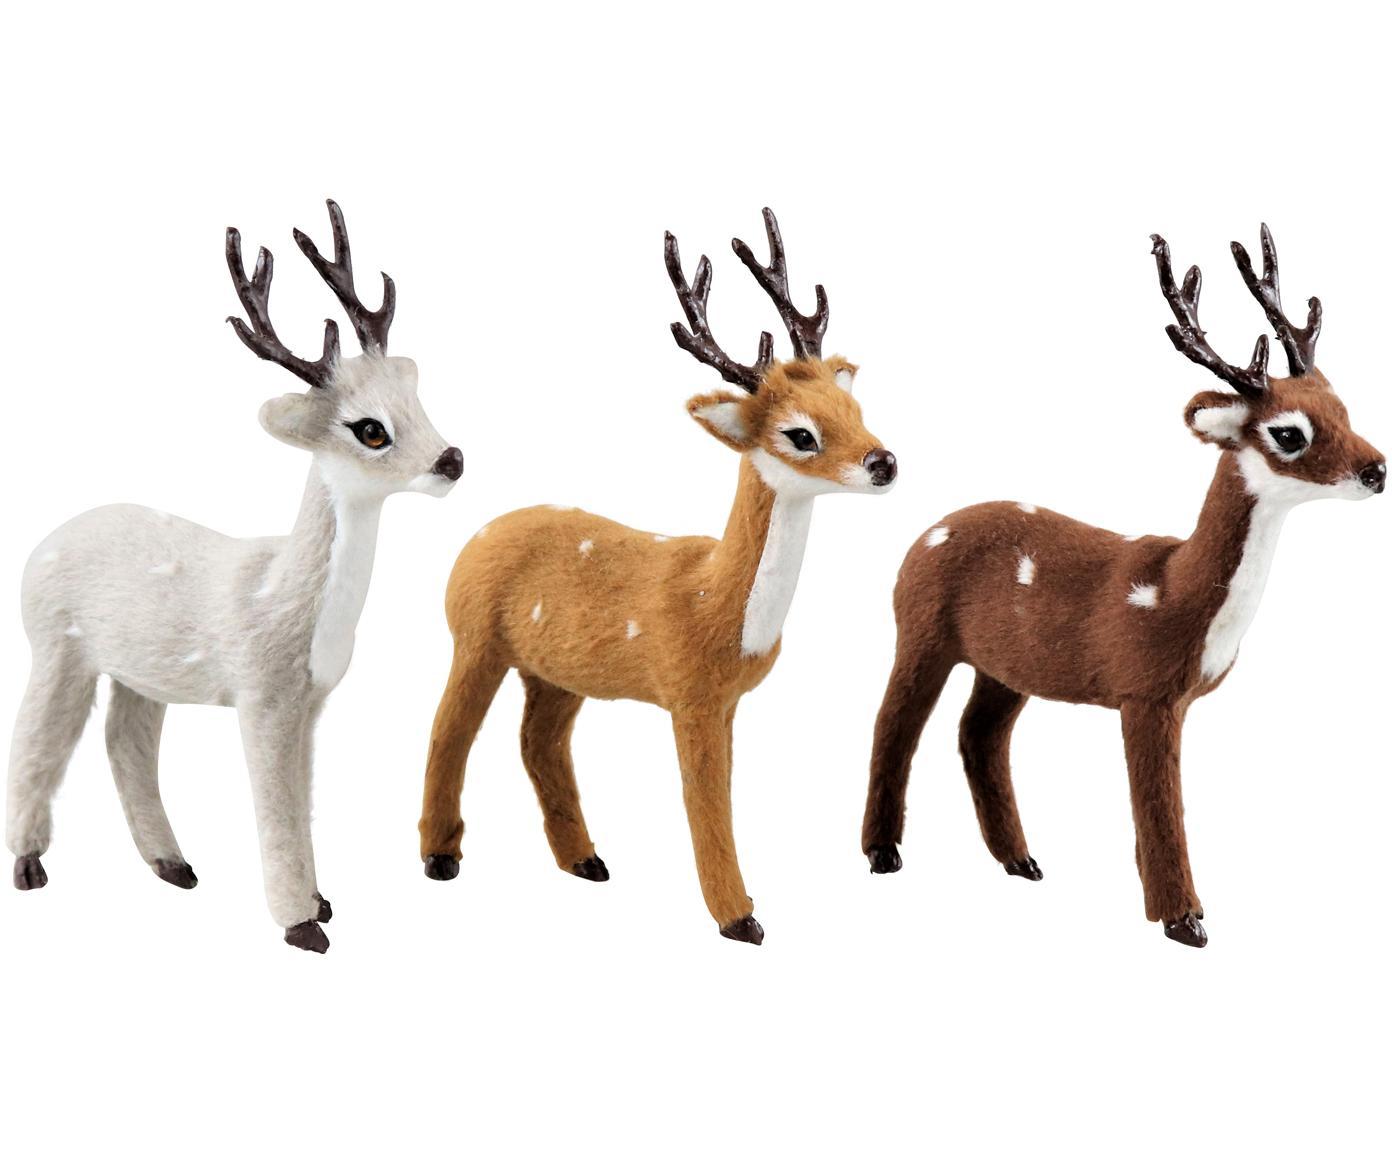 Set de figuras decorativos Deer, 3pzas., Poliresina, Marrón, gris, blanco, An 13 x Al 13 cm